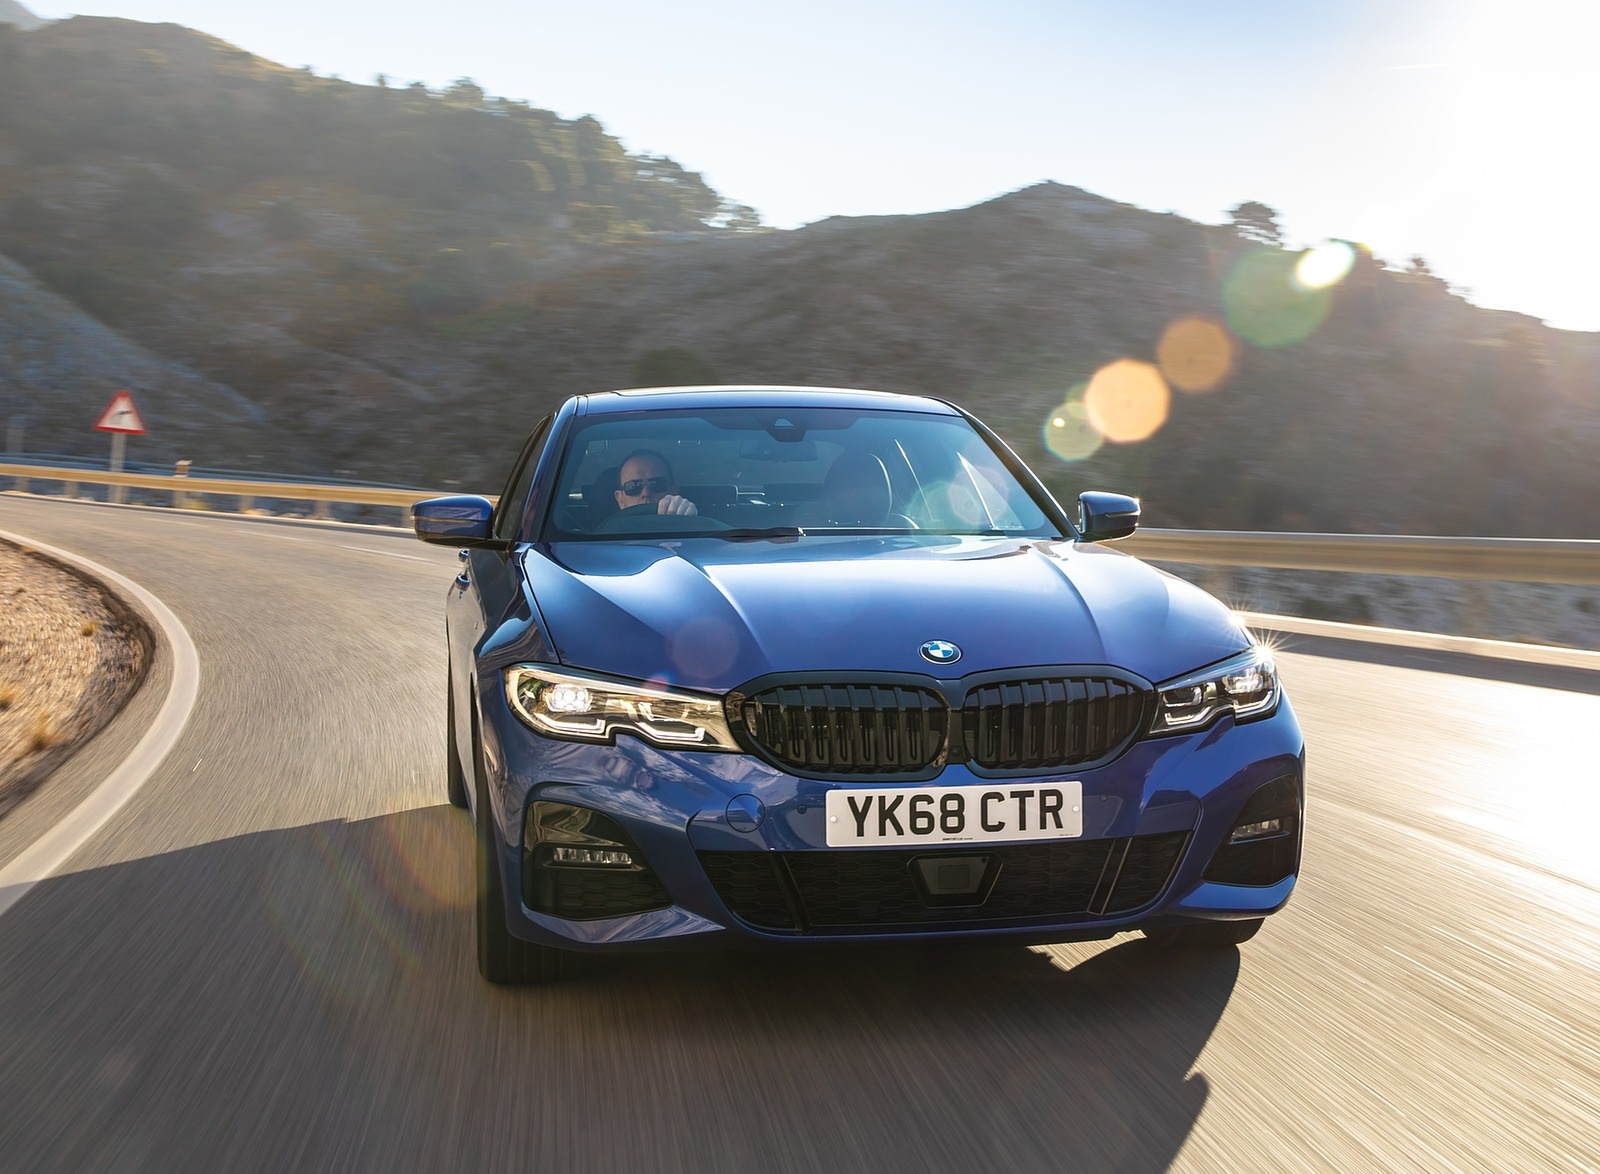 2019 BMW 3-Series Saloon 320d xDrive (UK-Spec) Front Wallpapers (14)